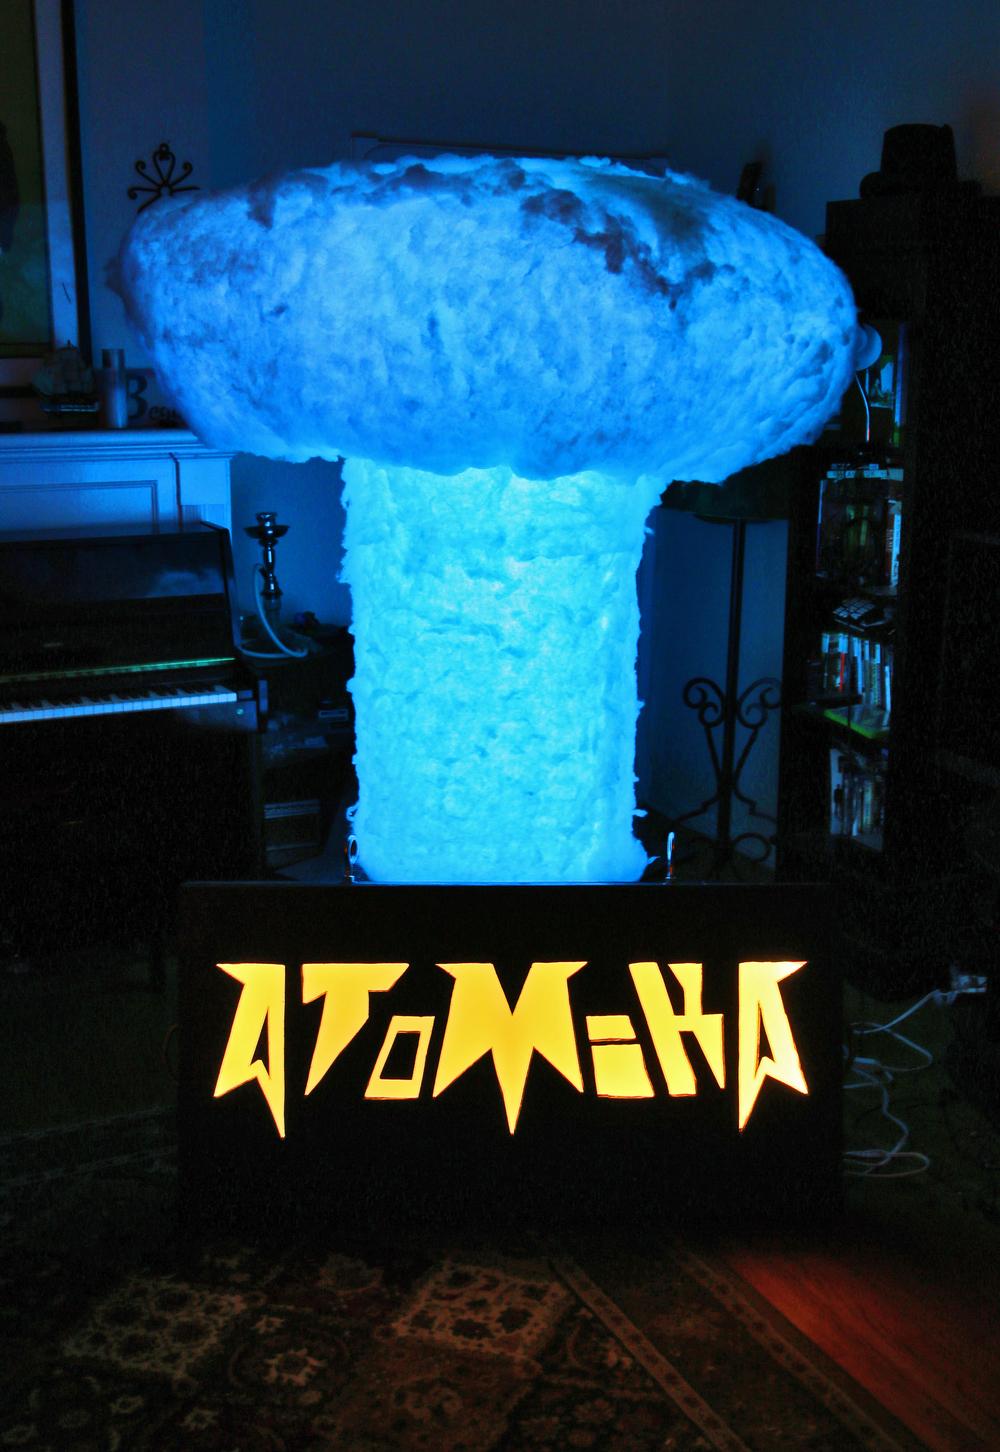 Atomika 3D Blue.jpg